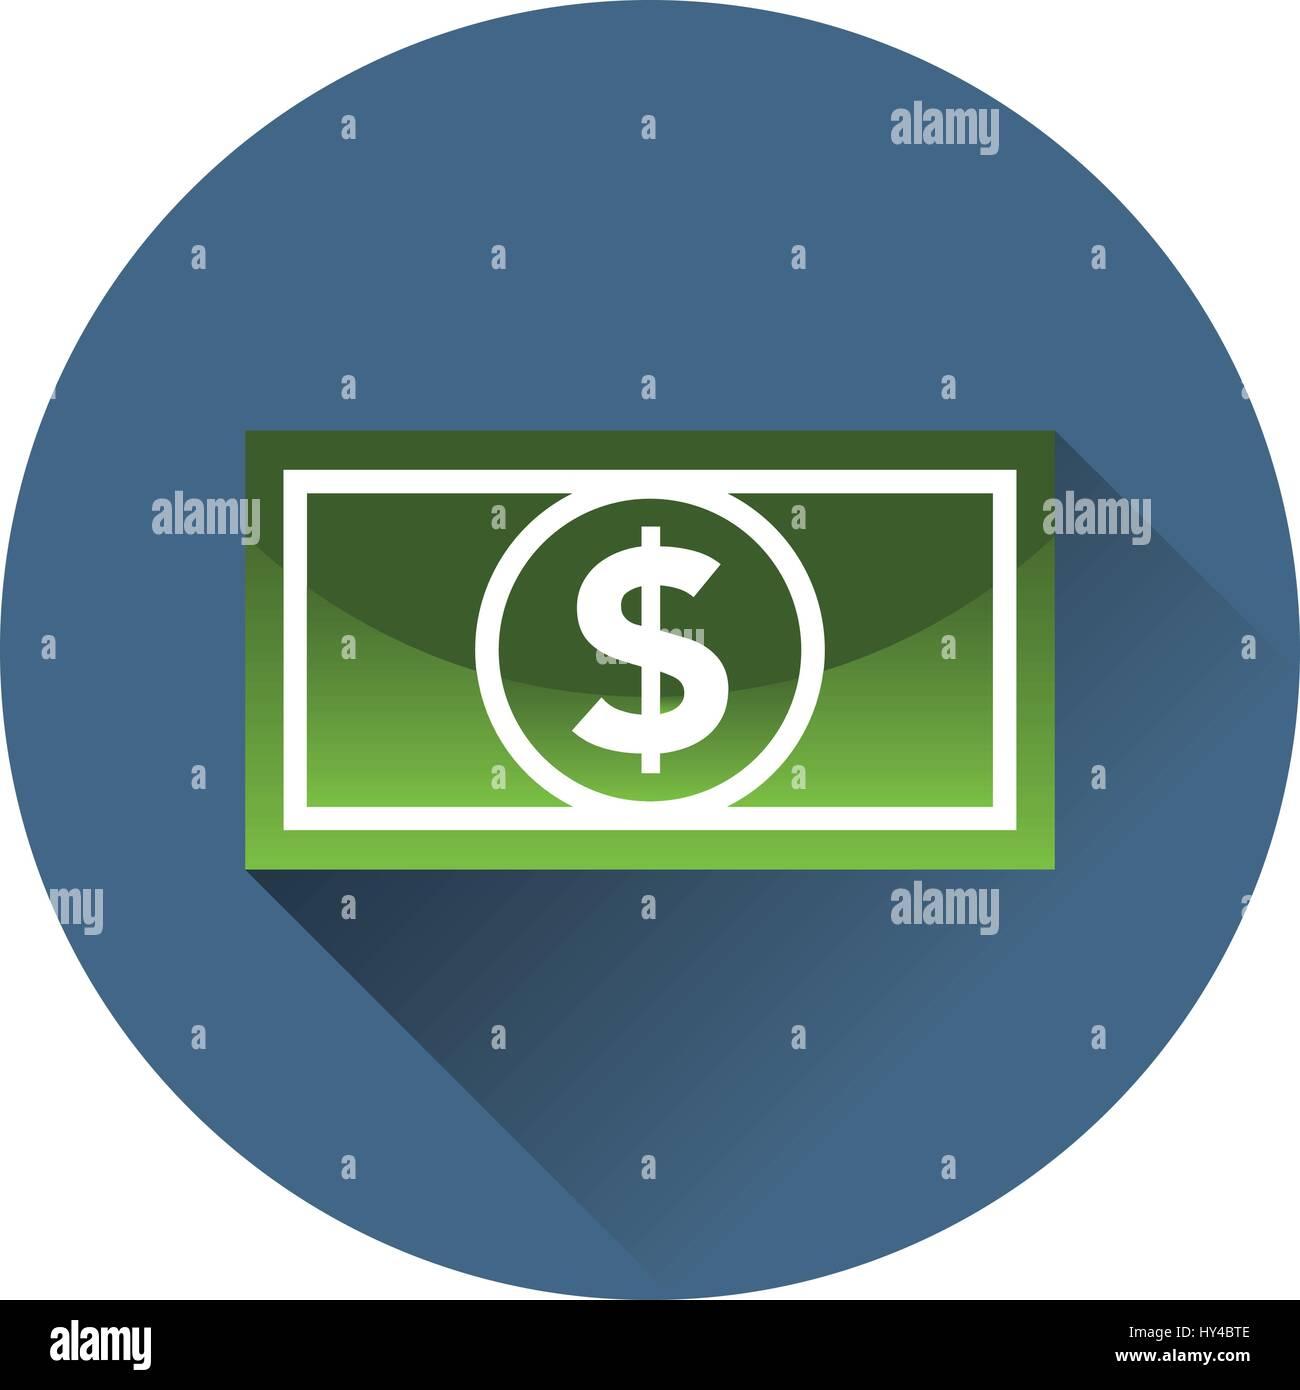 Dollar bill icon in a circle - Stock Vector